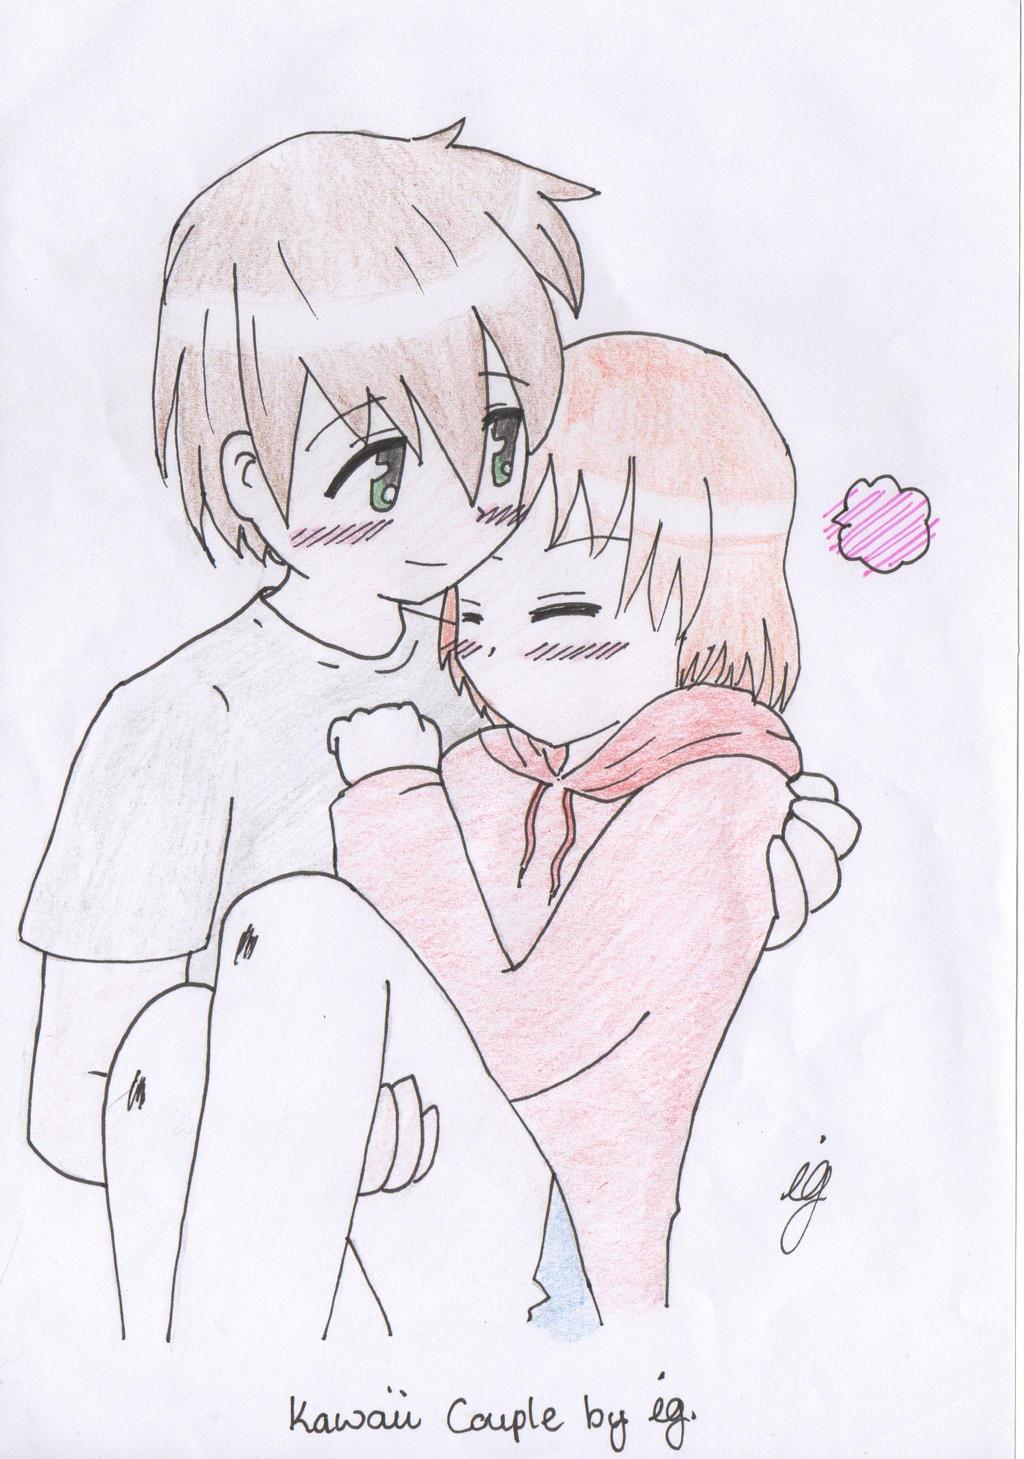 Cute Anime Couple By Umineko93 On DeviantArt